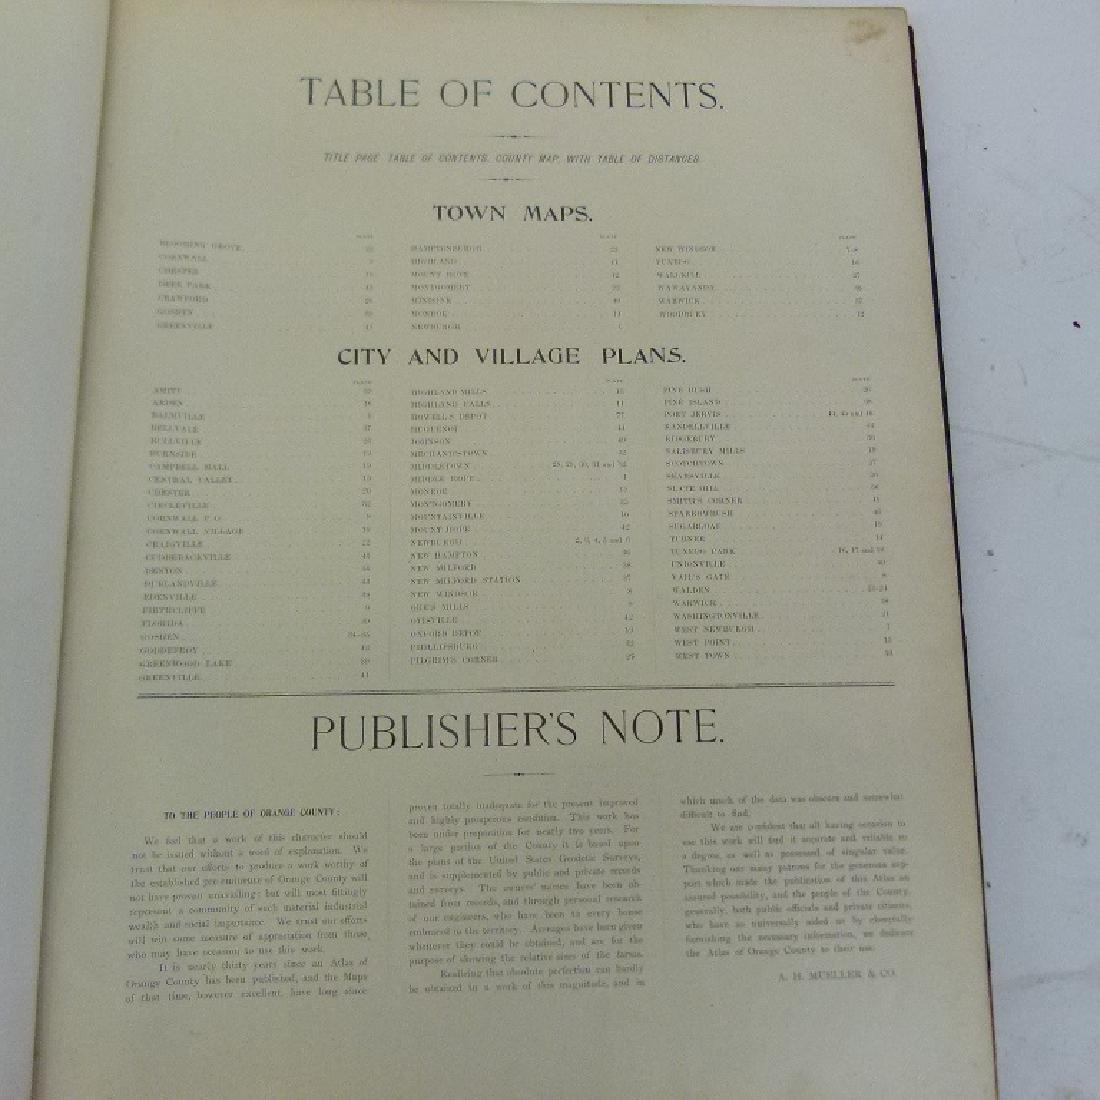 (2) ATLAS OF ORANGE COUNTY NY, A.H. MUELLER 1903 - 4